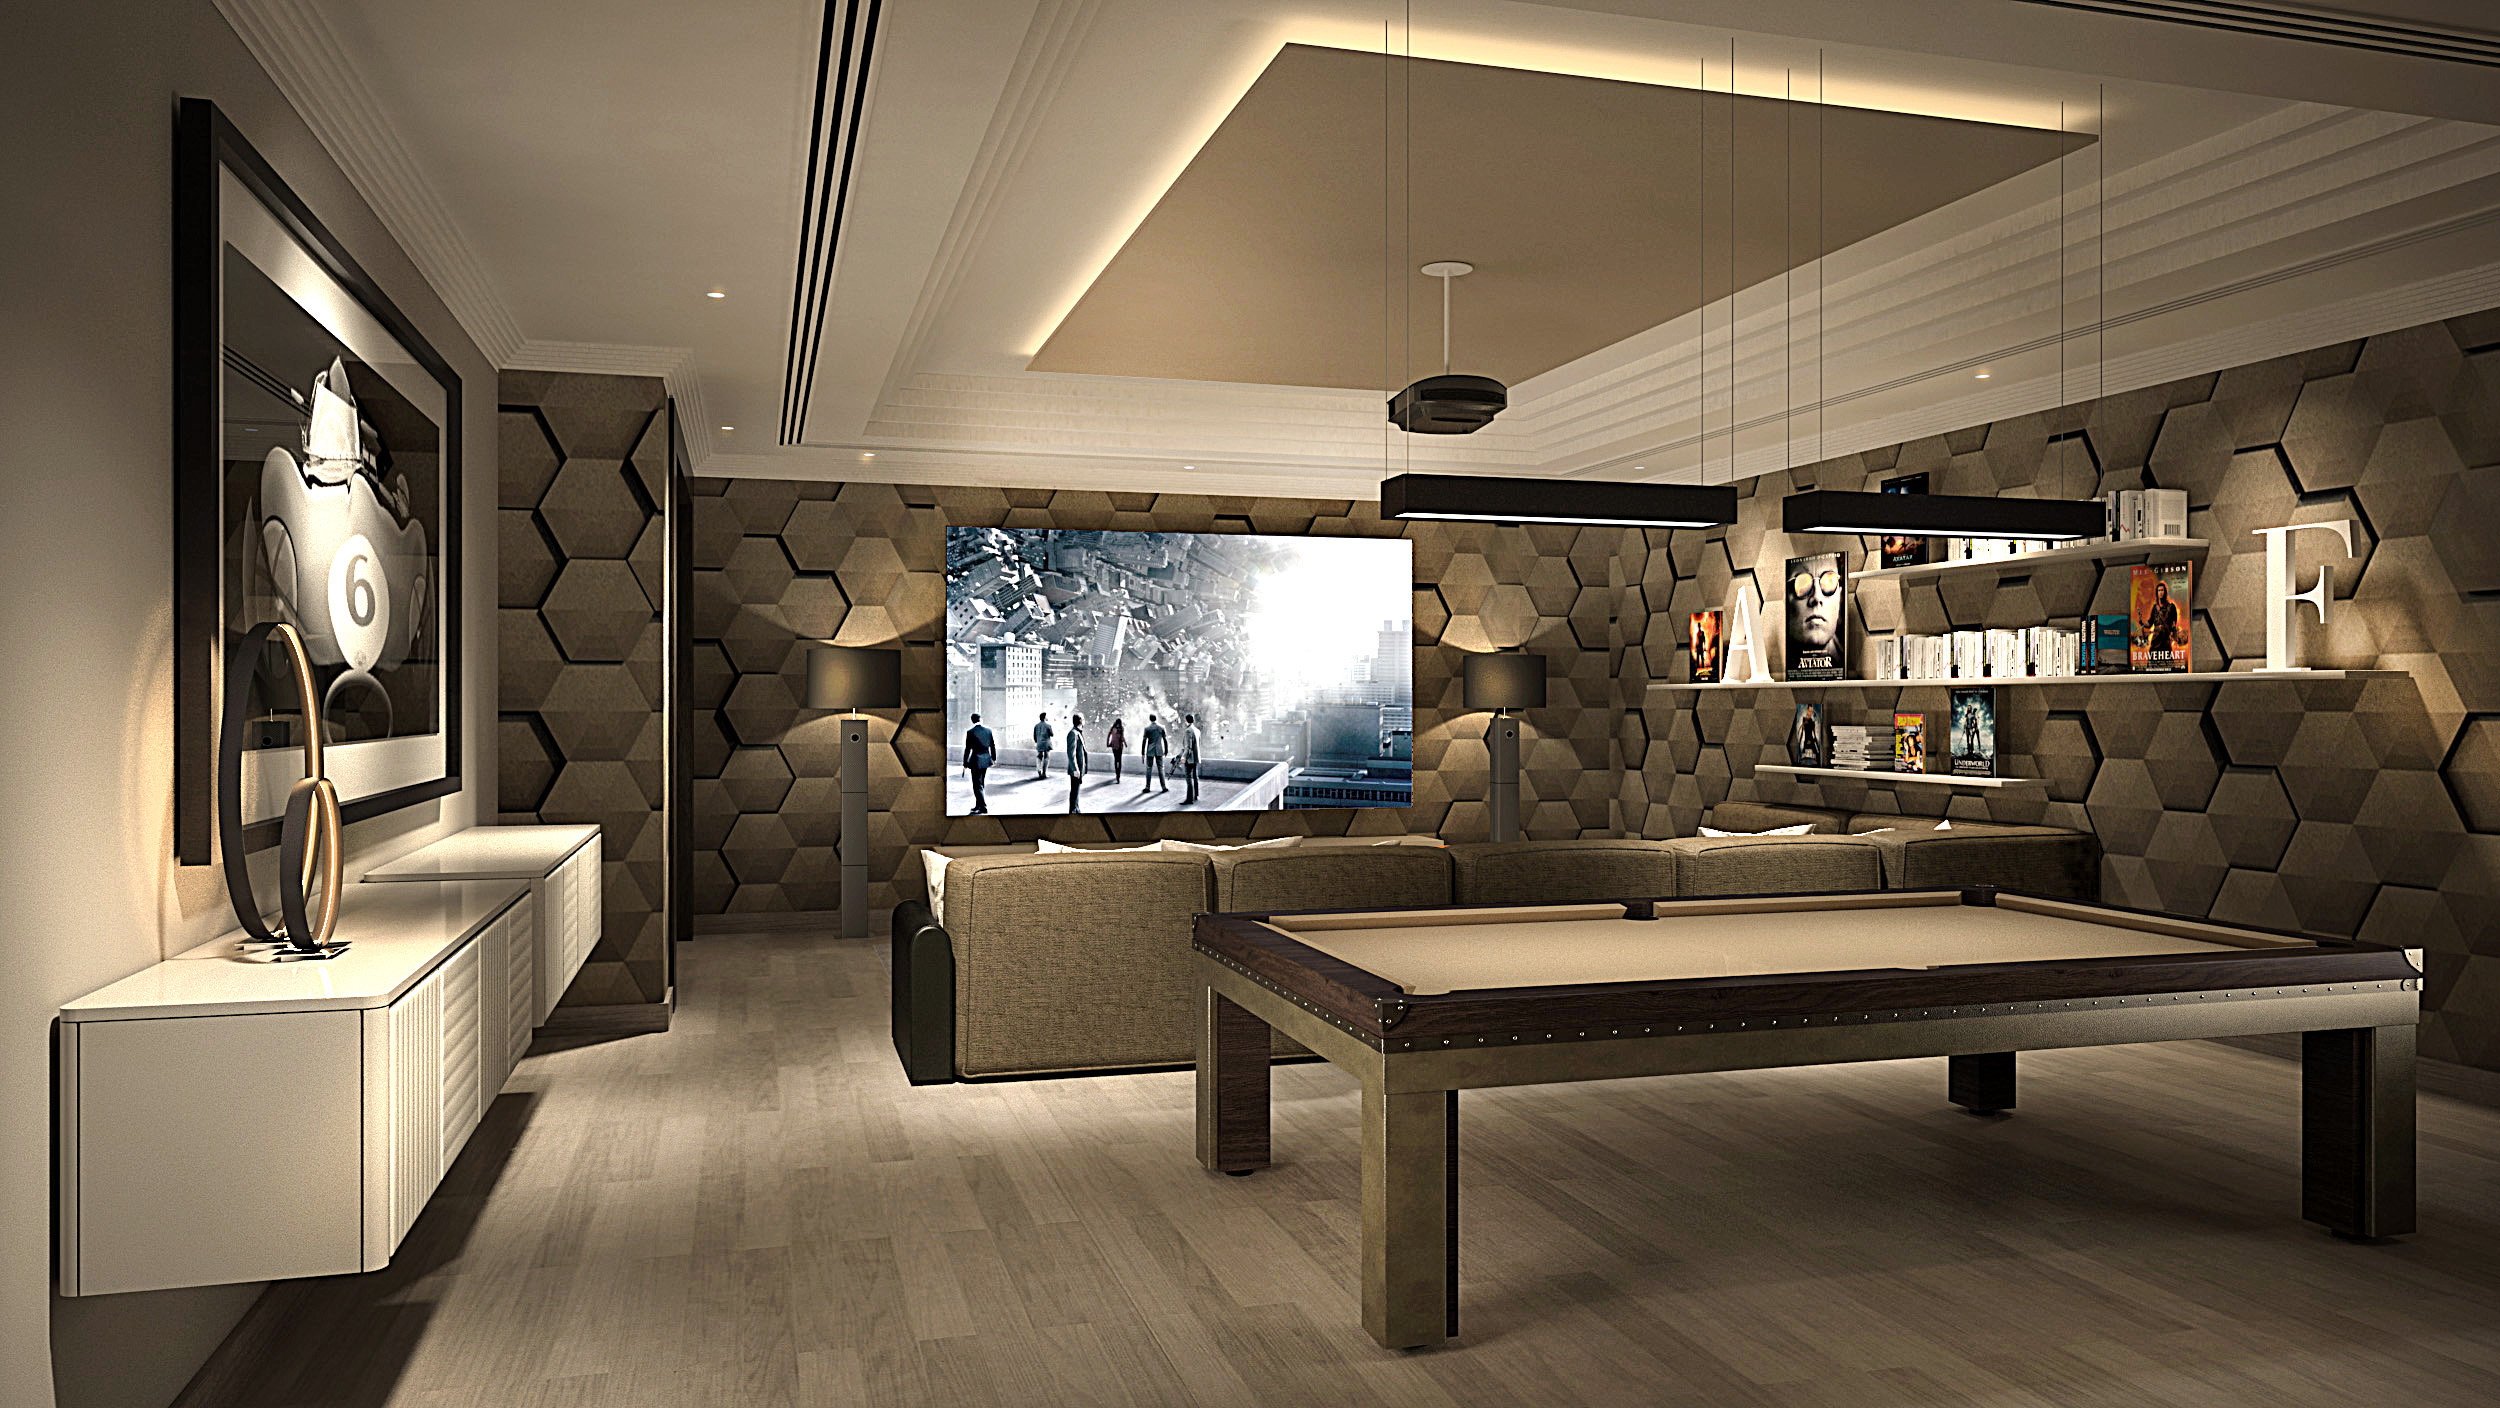 Luxury Home Cinema Seating Home Cinema Installation  Home Cinema Design The Perfect Home